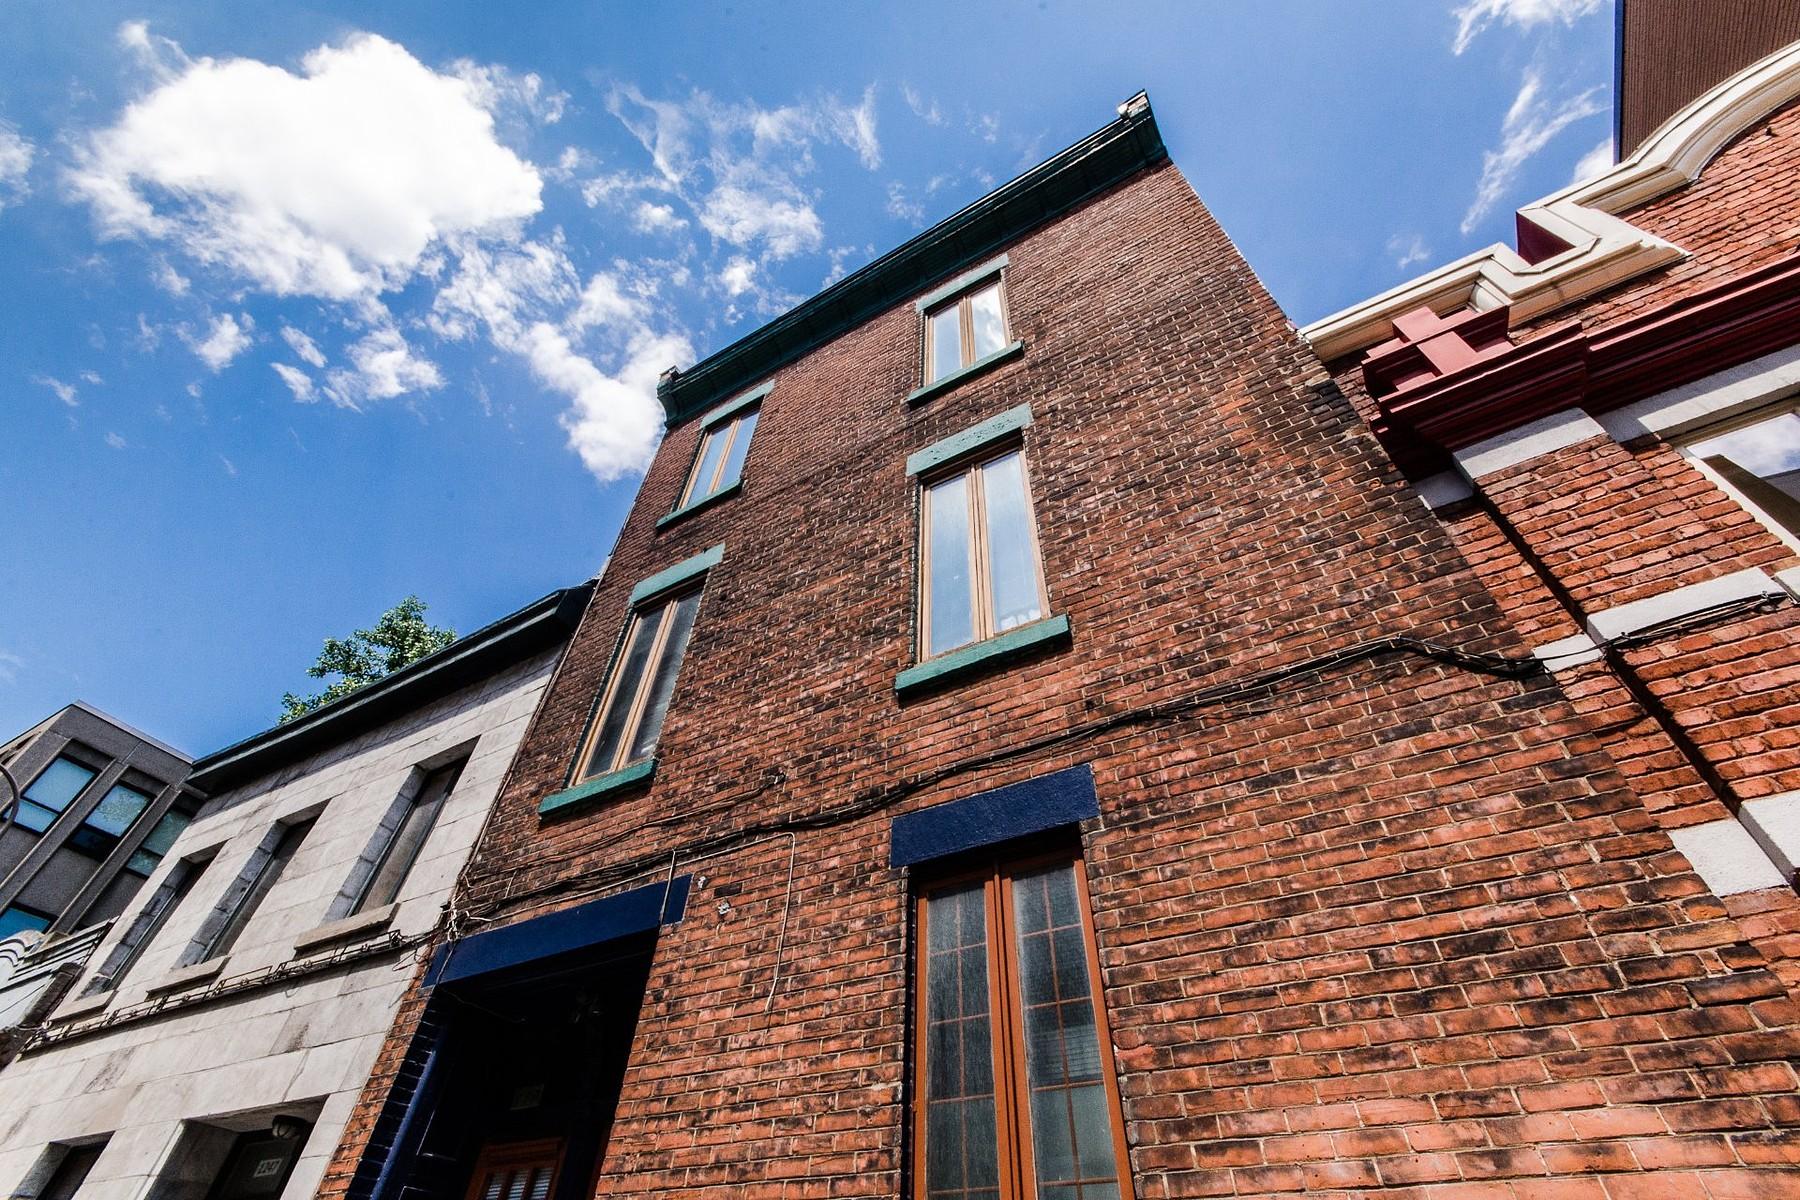 Частный односемейный дом для того Продажа на Ville-Marie (Montréal), Montréal 1243 Av. de l'Hôtel-de-Ville Montreal, Квебек H2K3A9 Канада